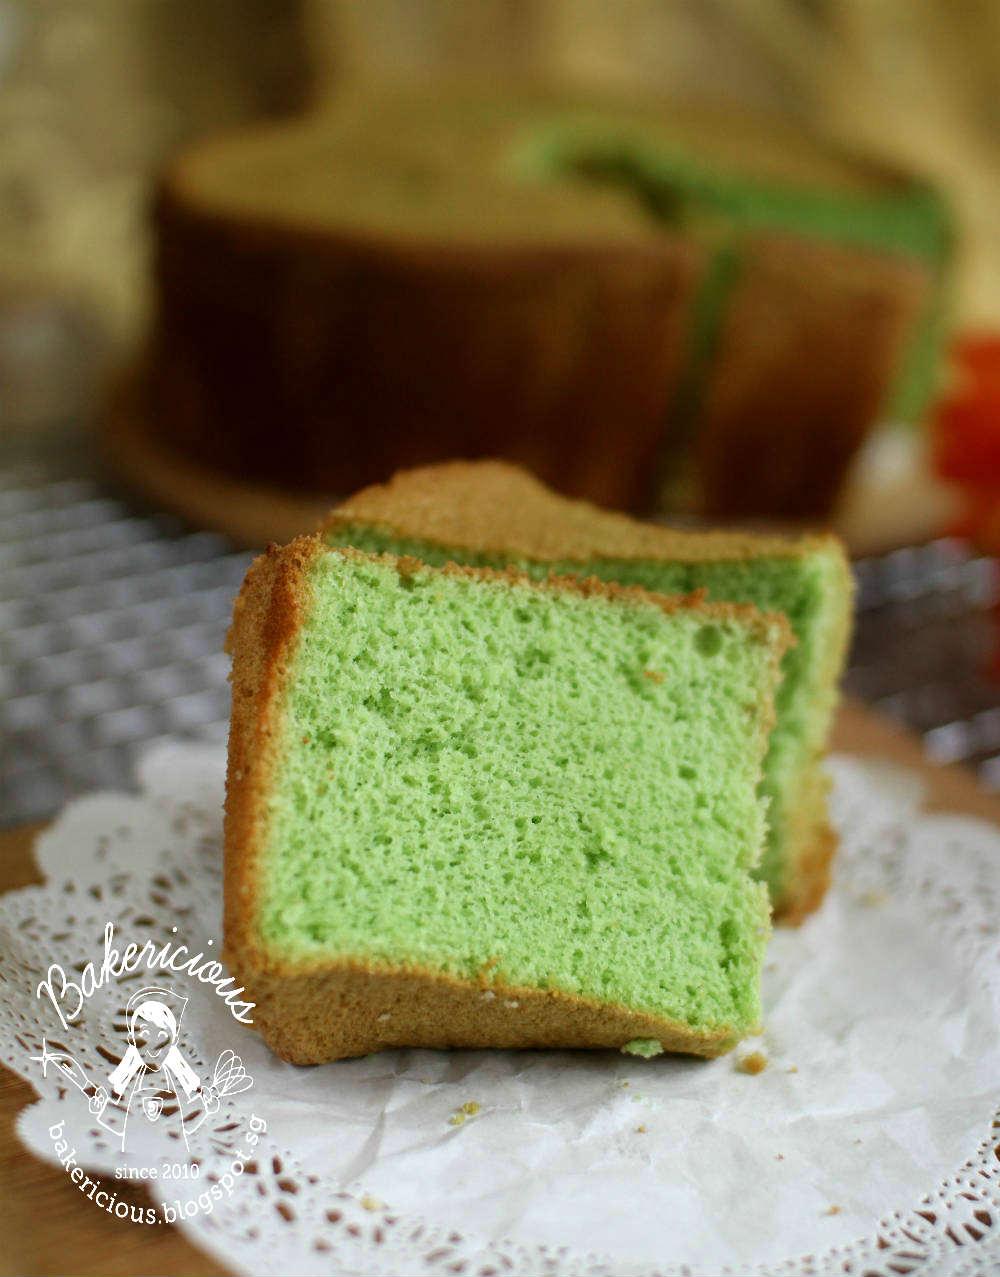 Bakericious Pandan Desiccated Coconut Rice Flour Chiffon